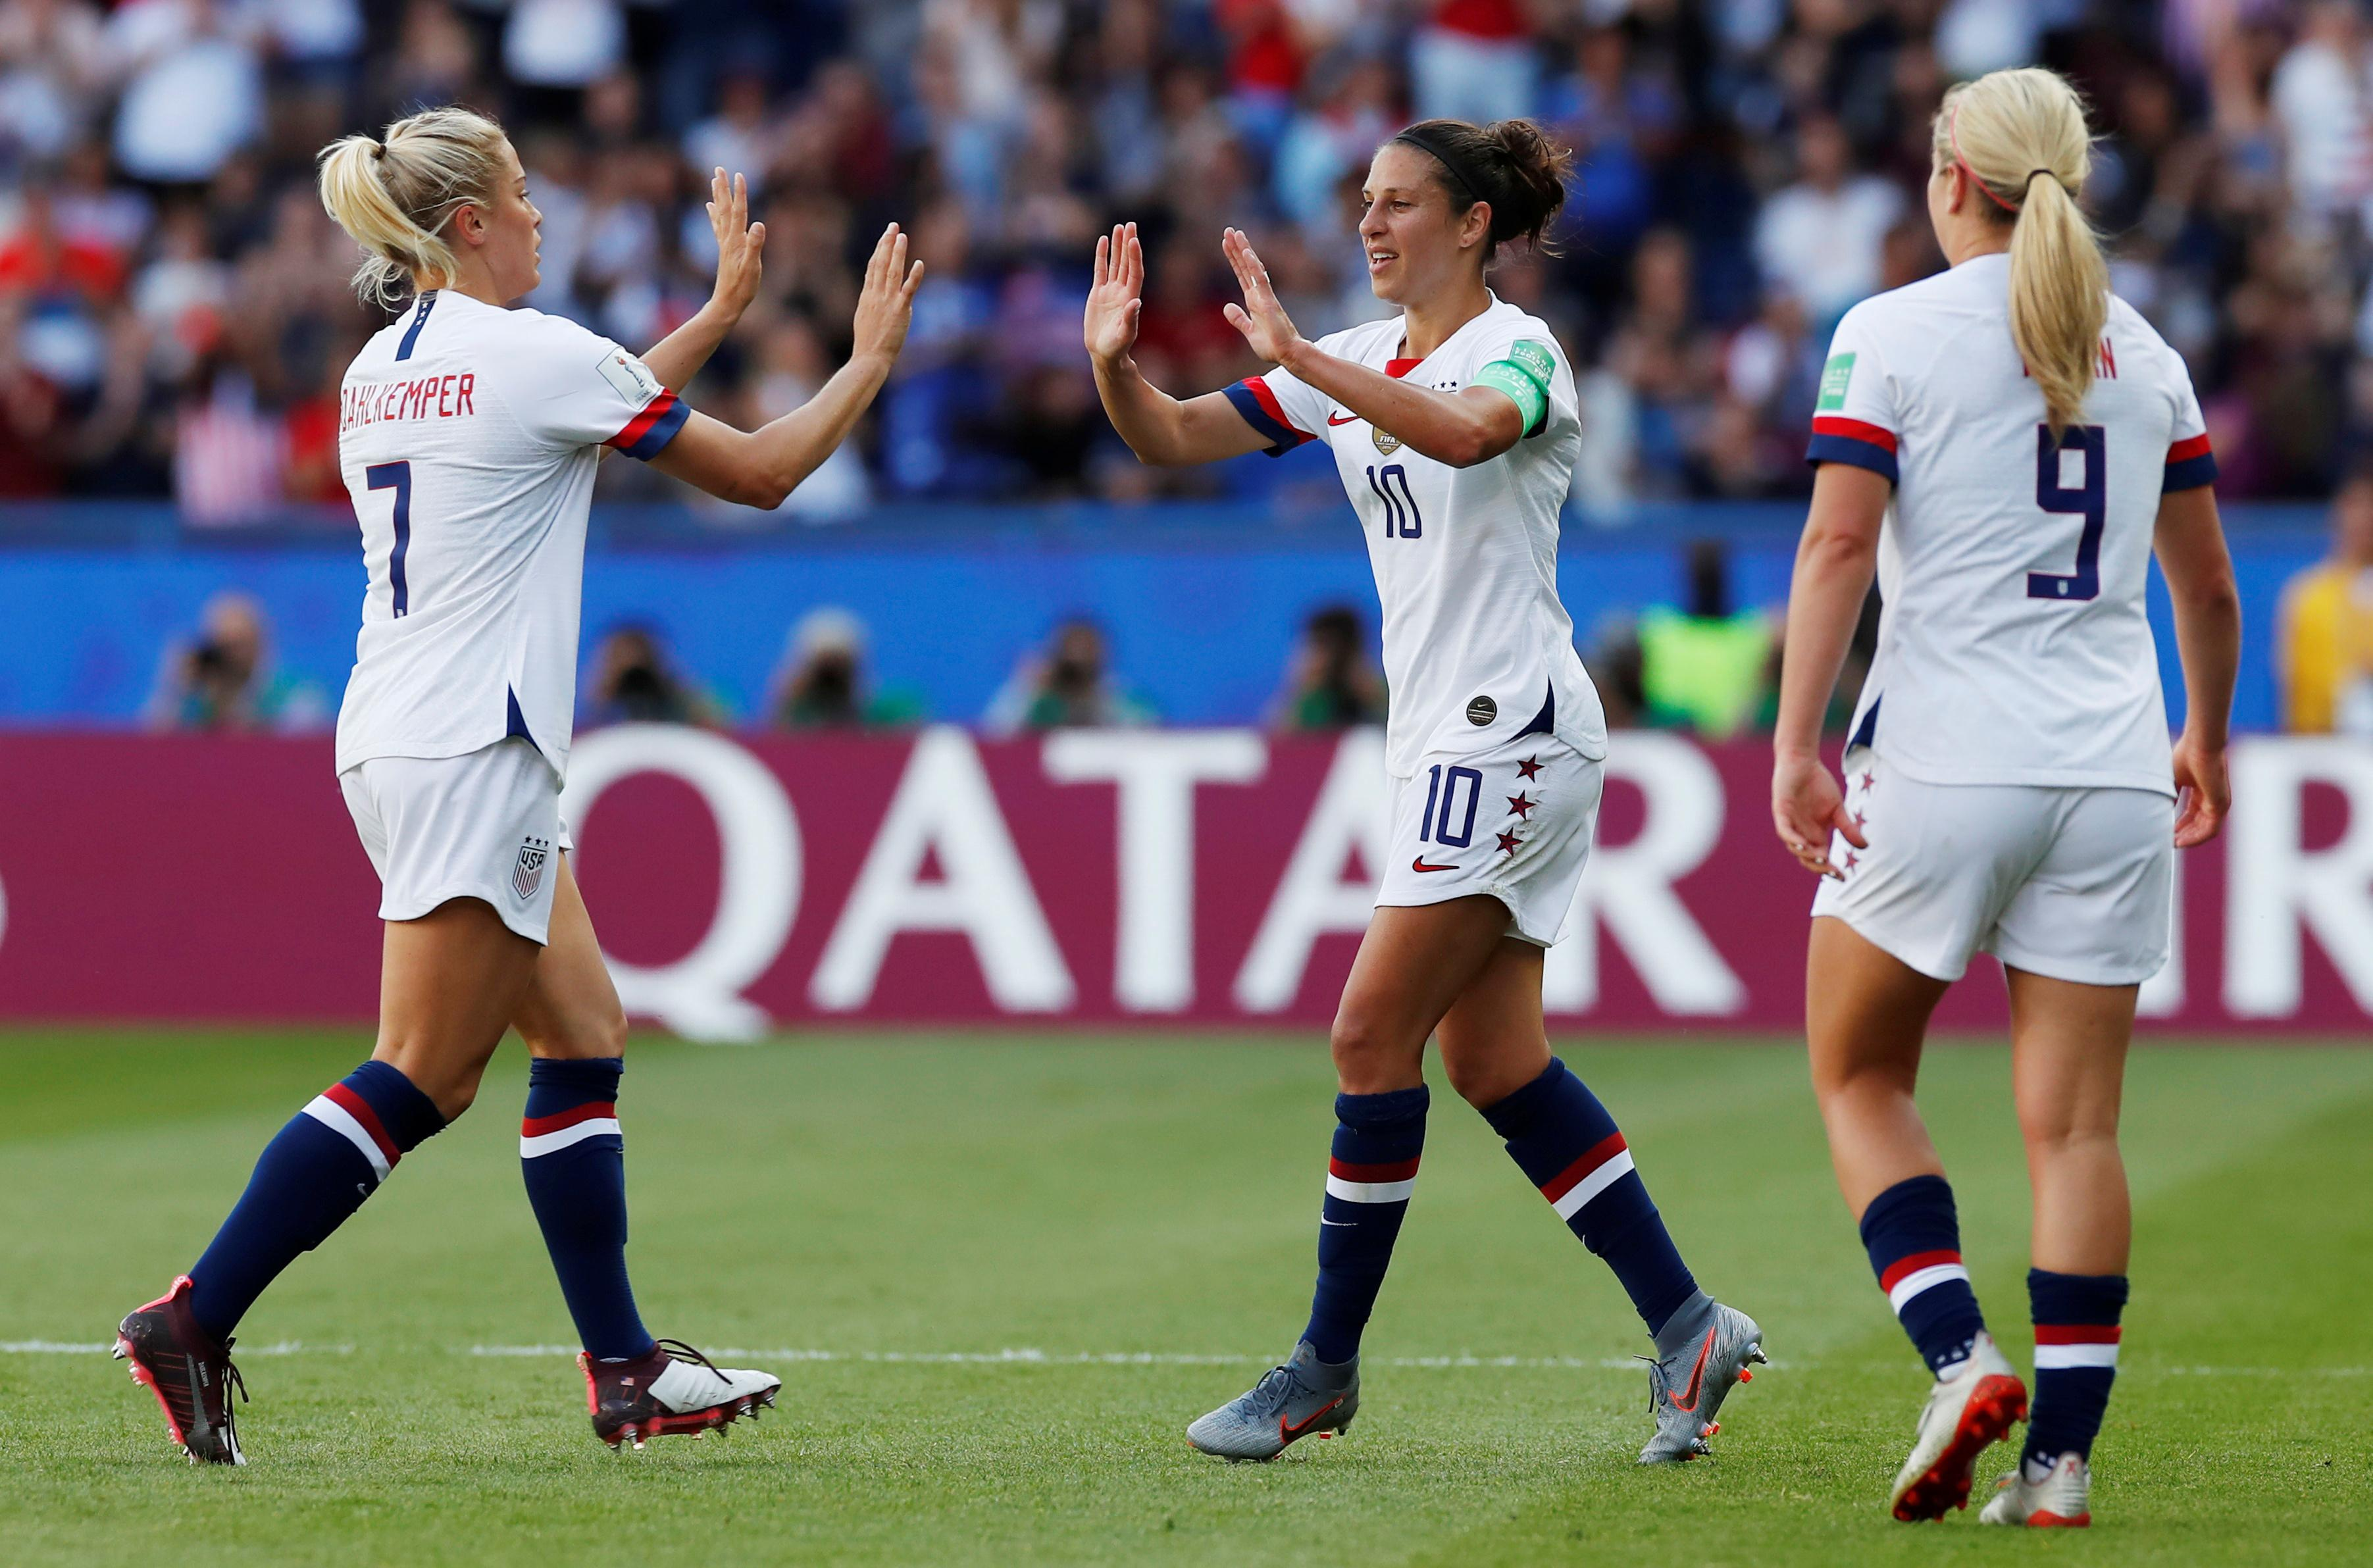 Lloyd leads dominant U.S. past Chile into last 16